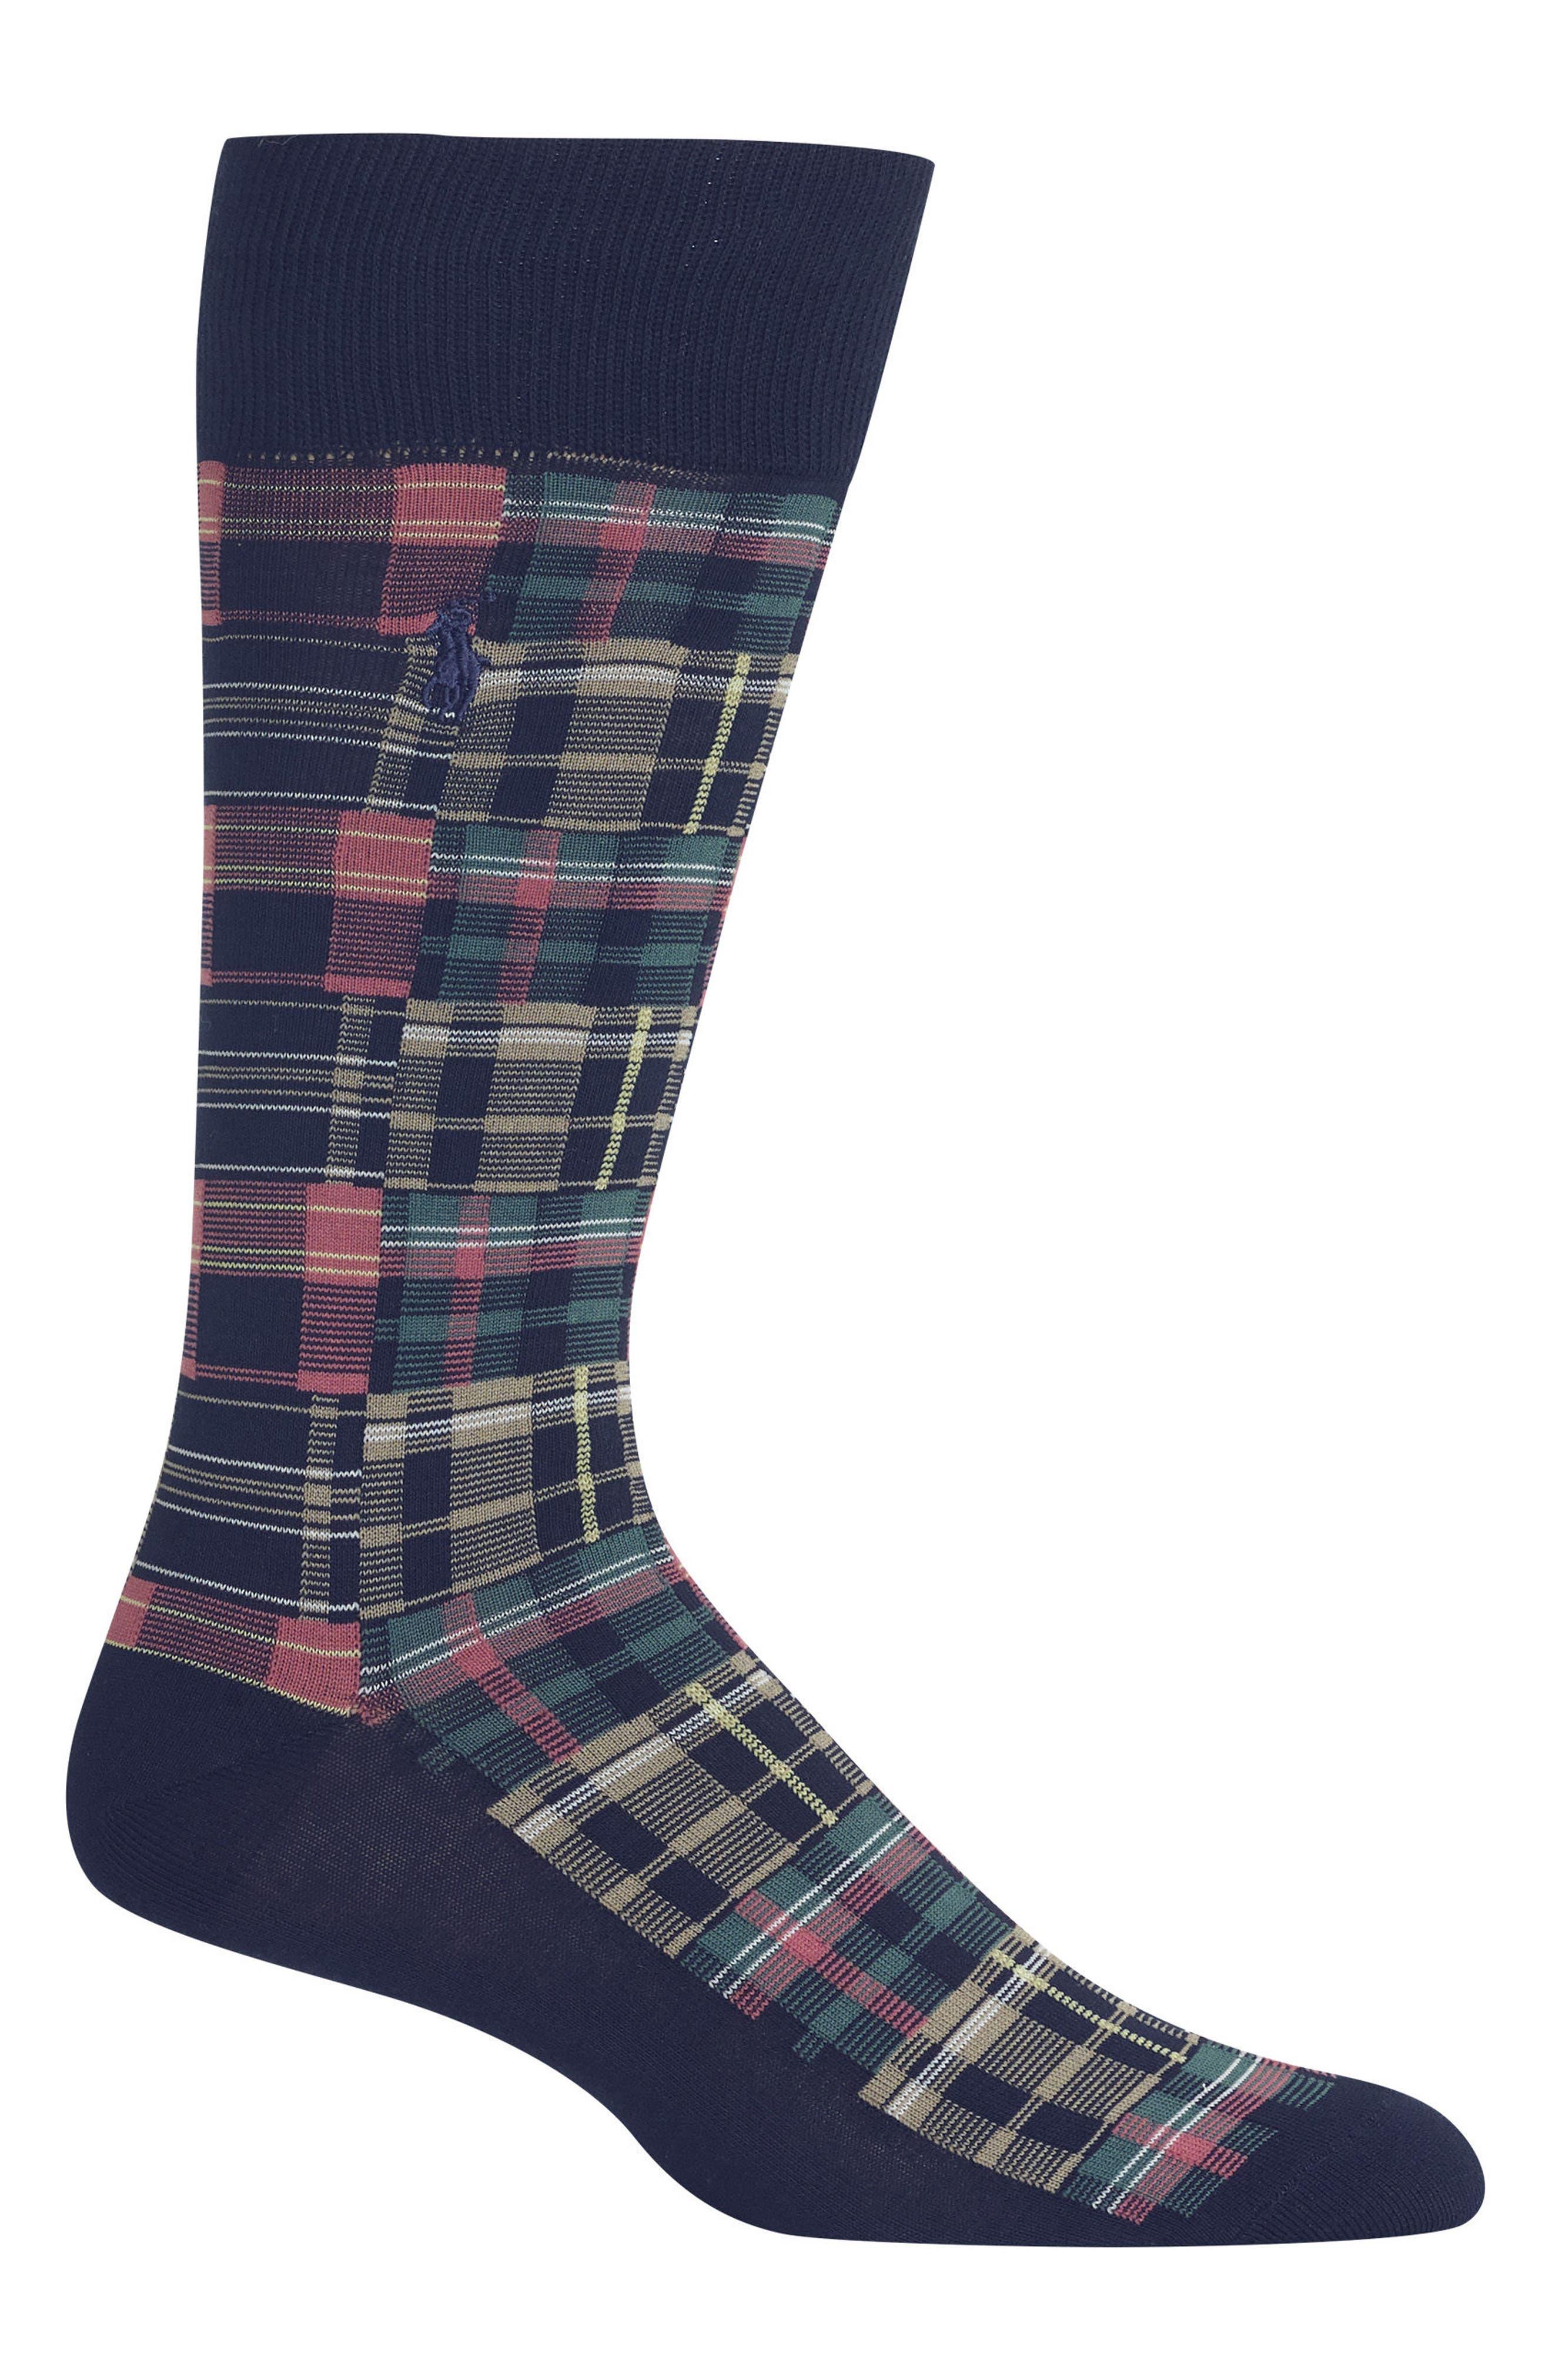 Ralph Lauren Patchwork Madras Socks,                             Main thumbnail 1, color,                             Navy